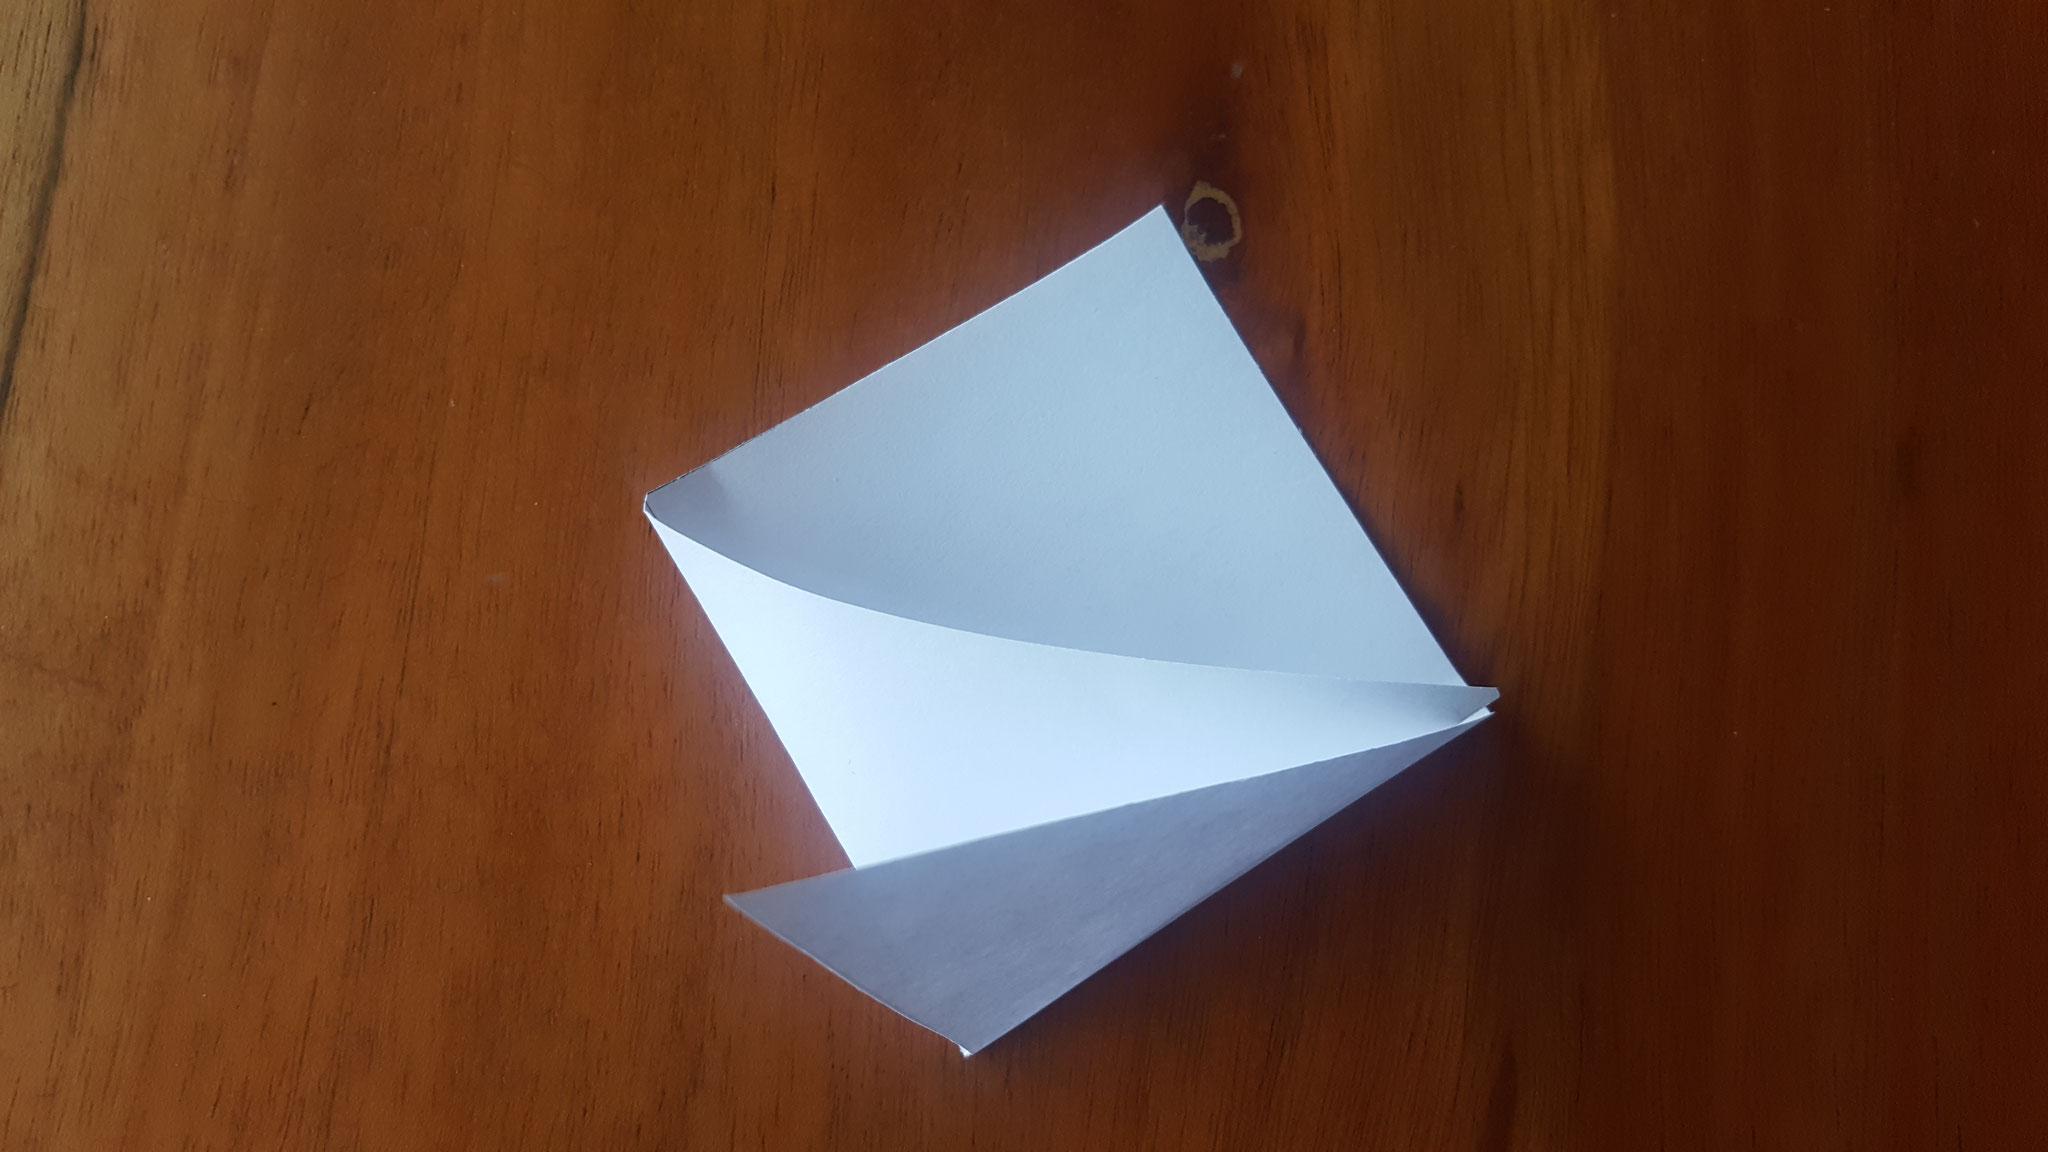 Beide Dreiecke zur Mitte hingeknickt